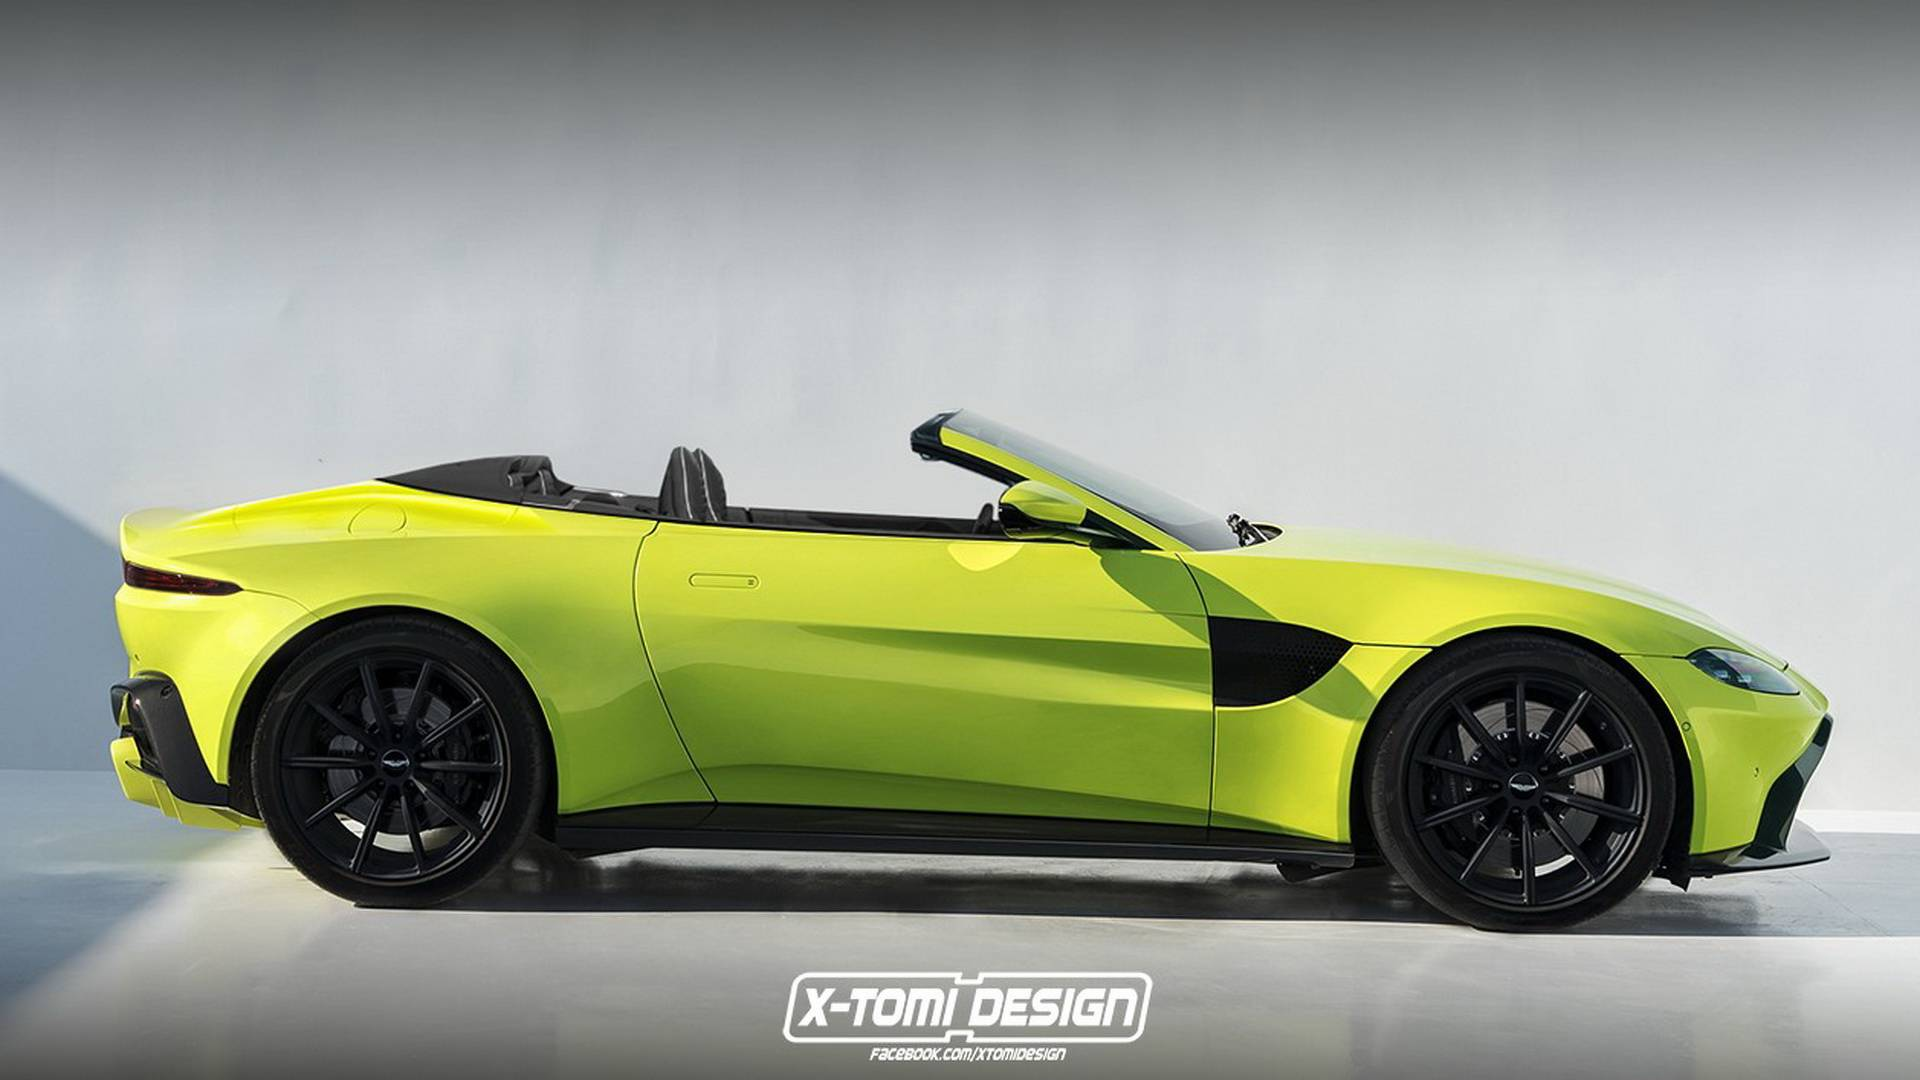 Aston Martin Vantage Roadster Confirmed For 2019 Reveal